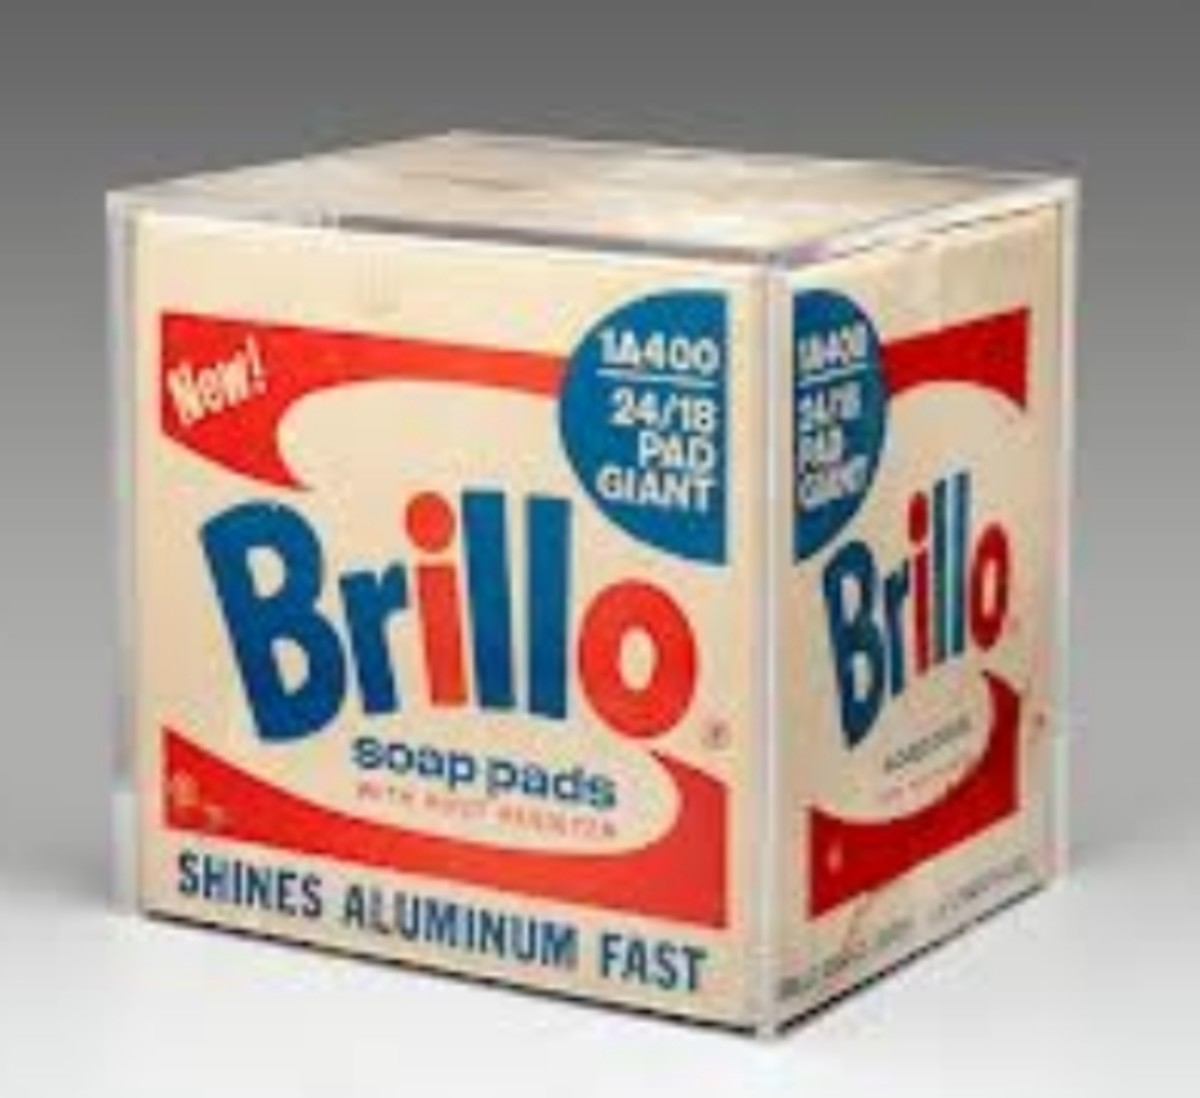 """Brillo Box"" by Andy Warhol, Circa 1964"